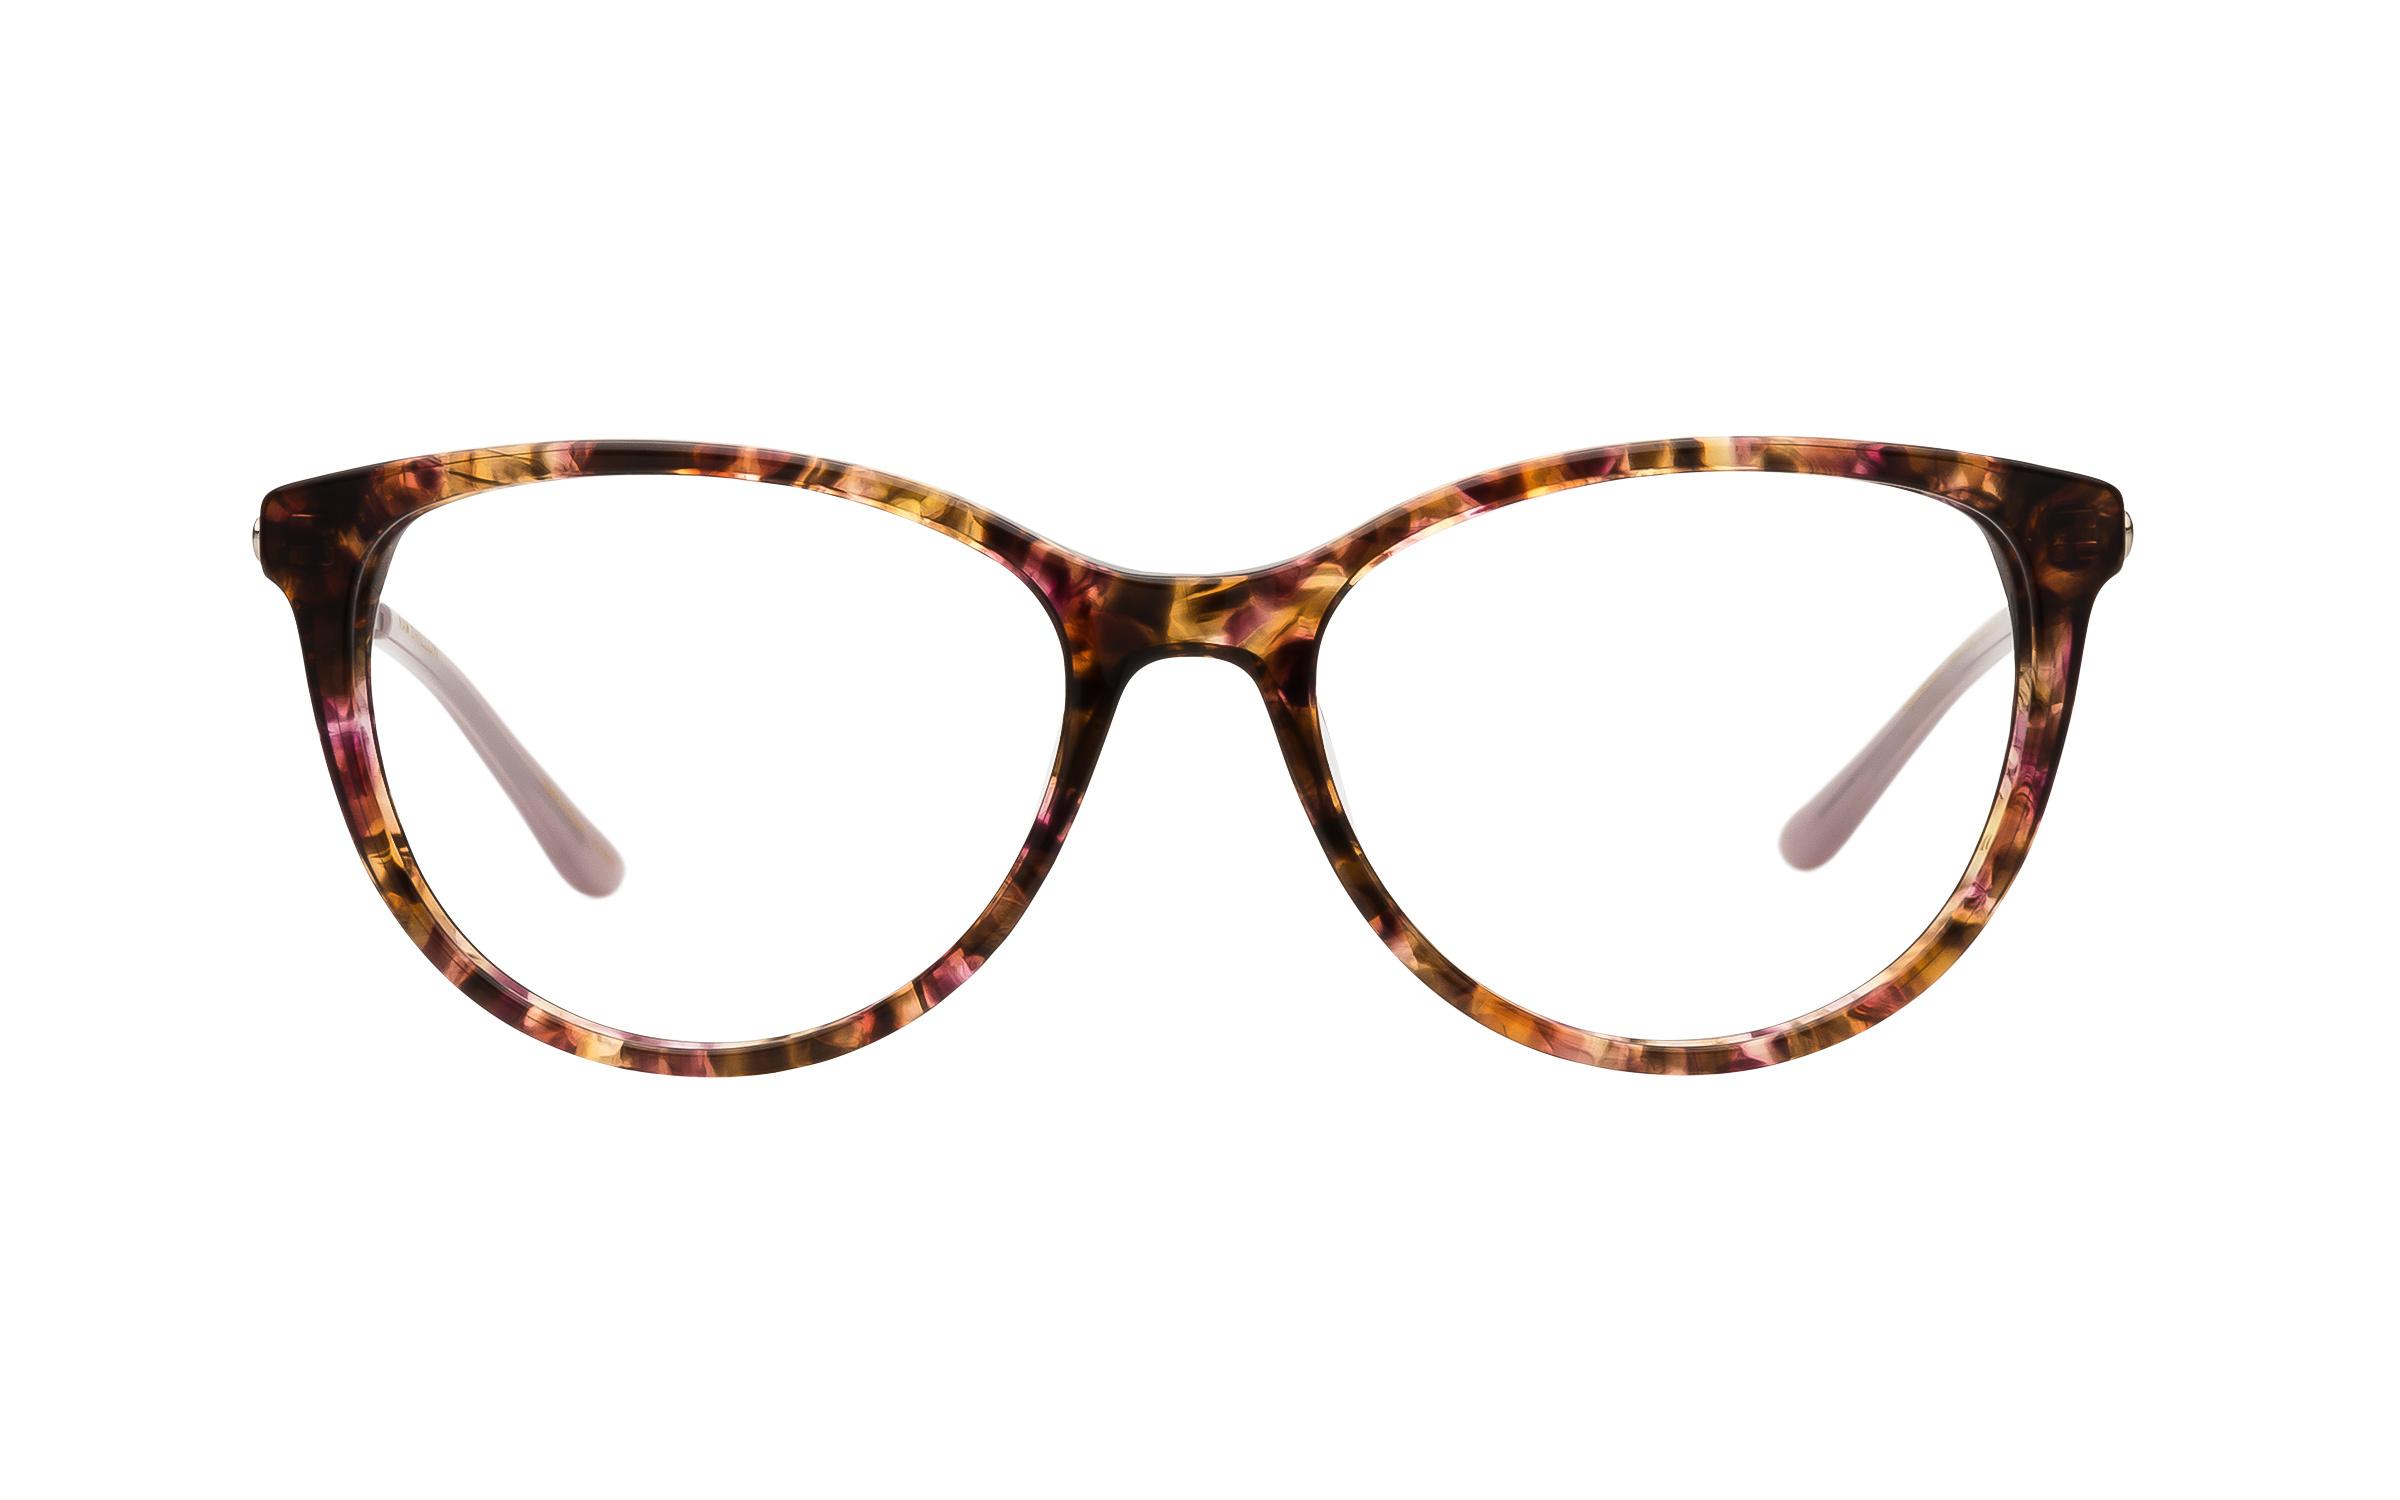 Kam Dhillon Women's Glasses Cat-Eye Tortoise/Purple/Brown Acetate/Metal Online Coastal